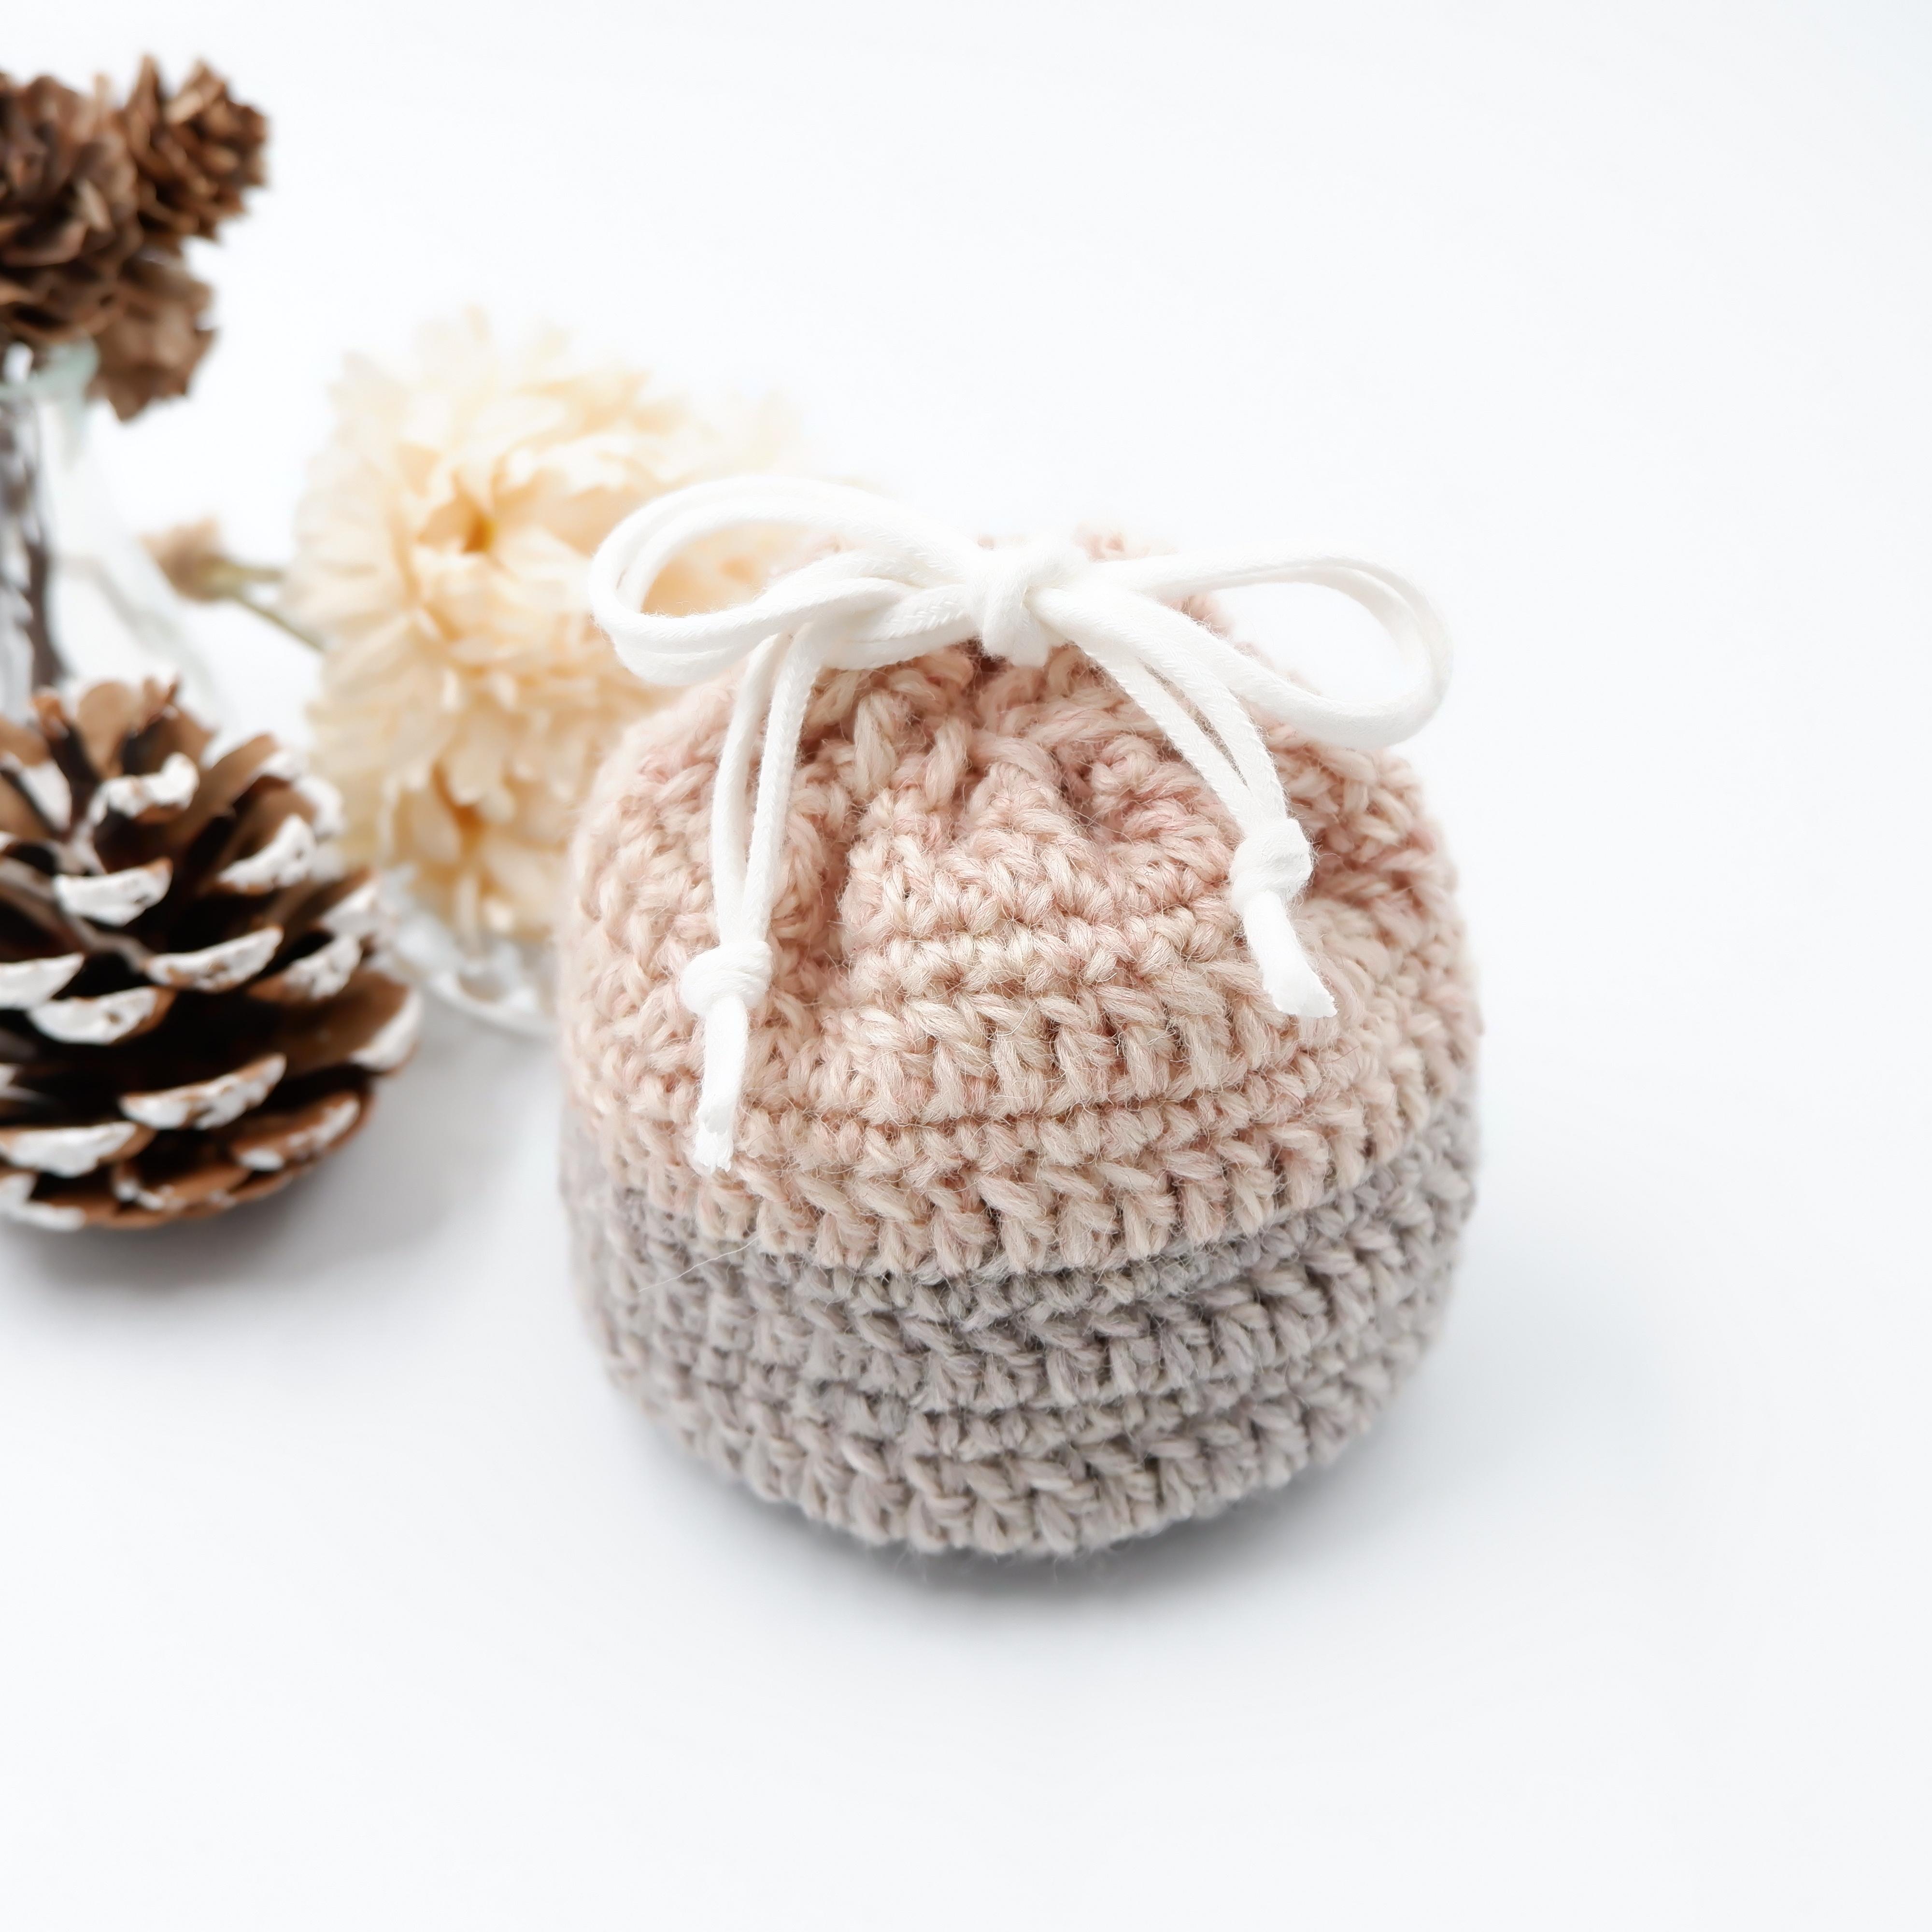 HanahanD 冬 巾着 手編み ツートン